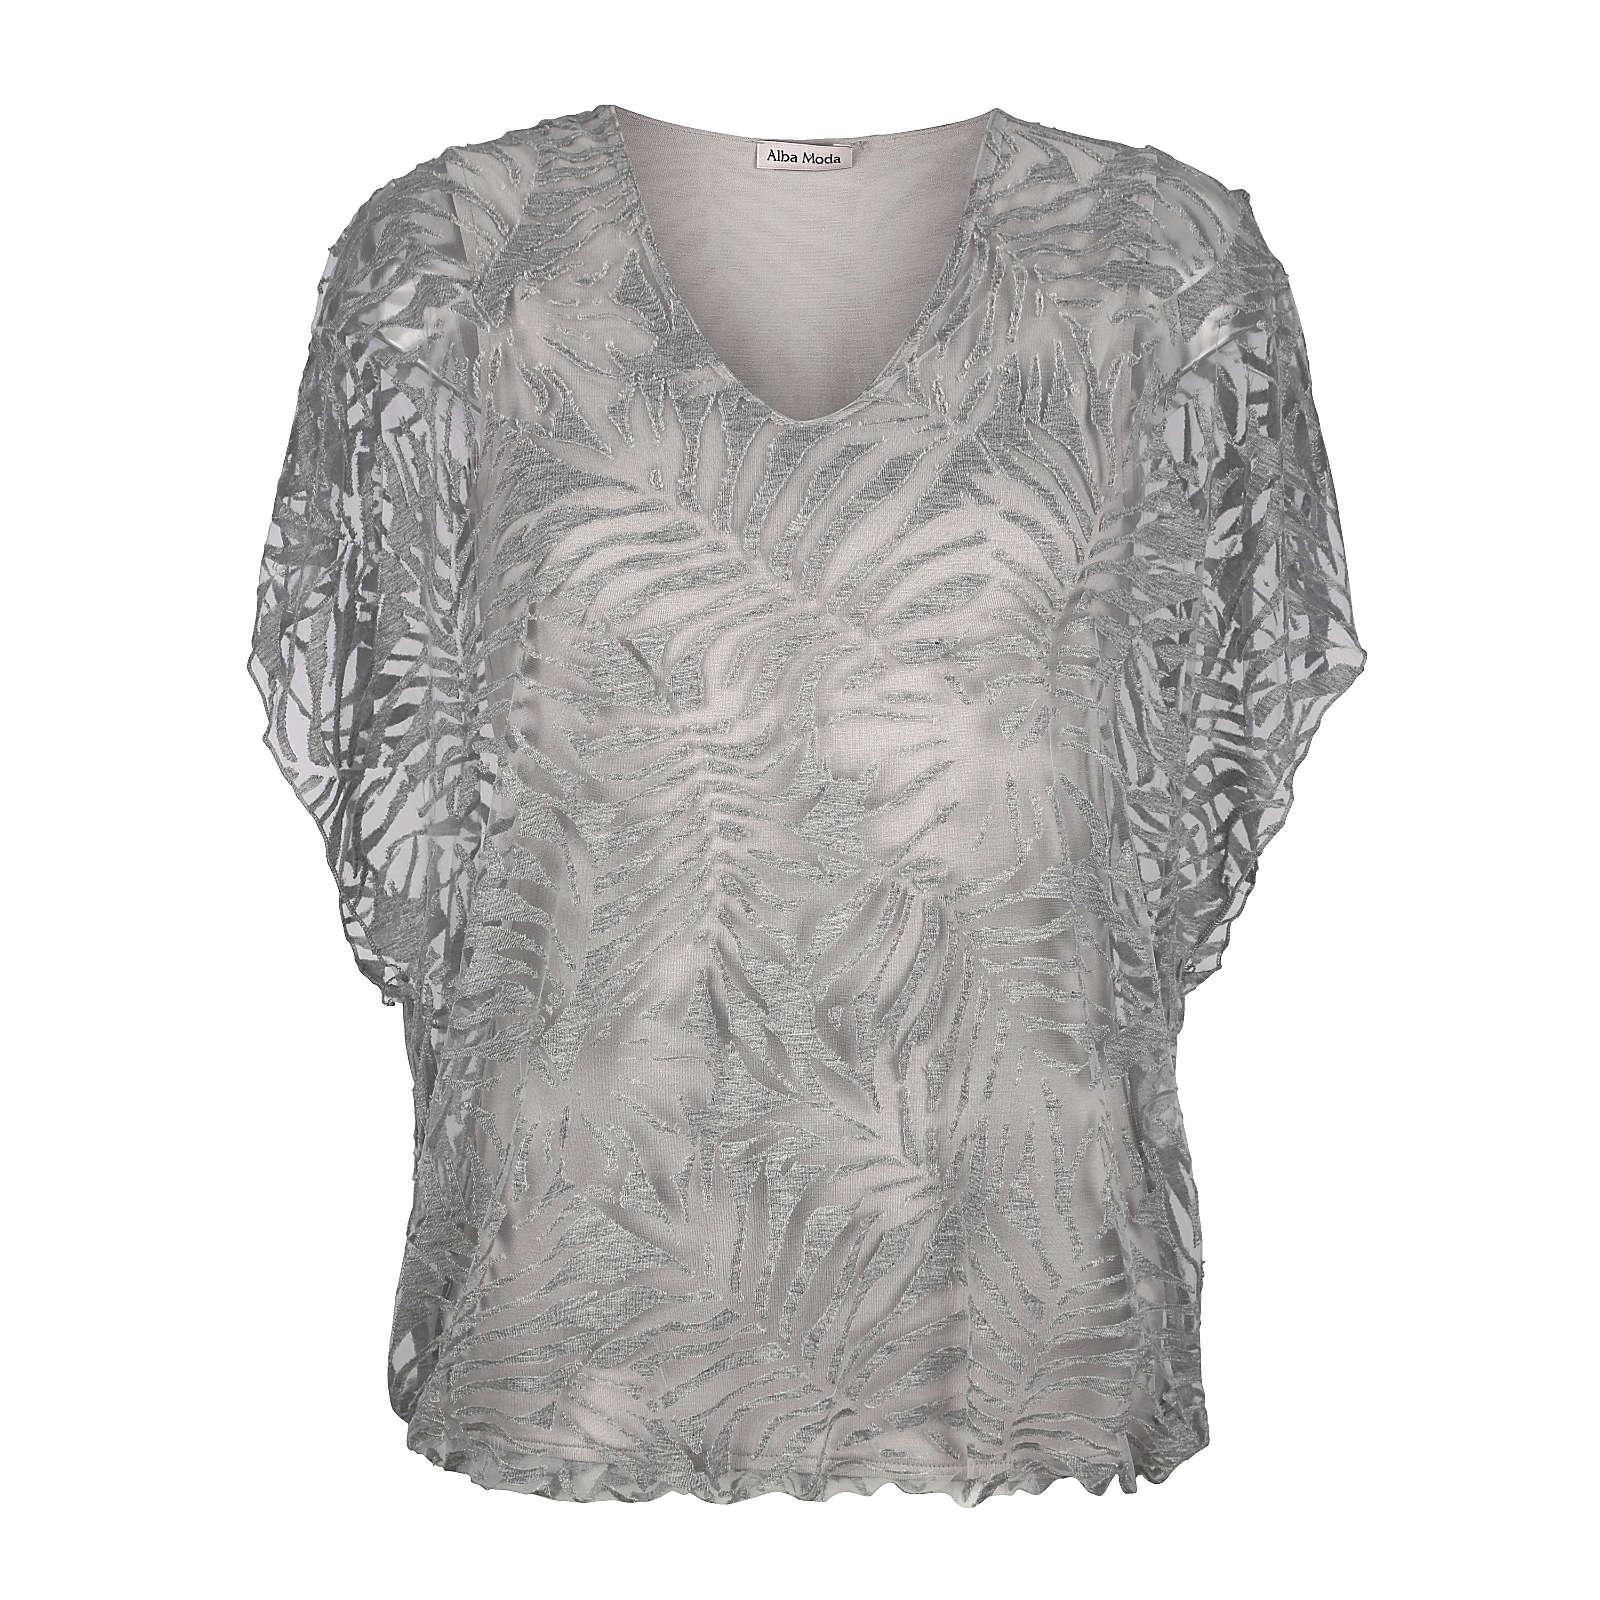 Alba Moda Shirt grau Damen Gr. 34